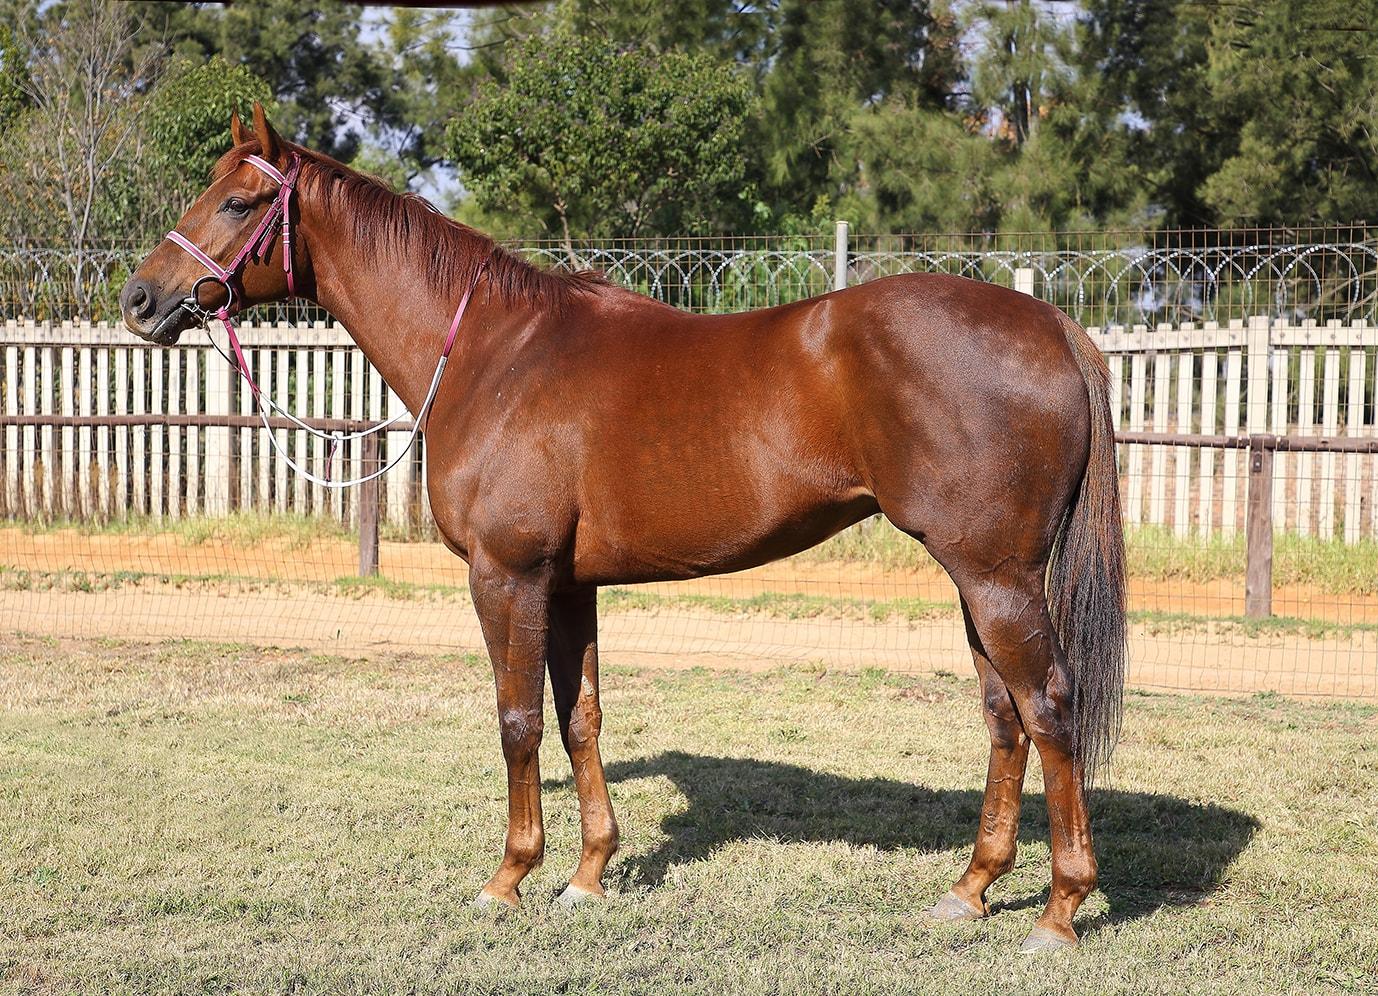 Coral Fever (photo credit: Gold Circle) - Horse Racing - Vodacom Durban July 2018